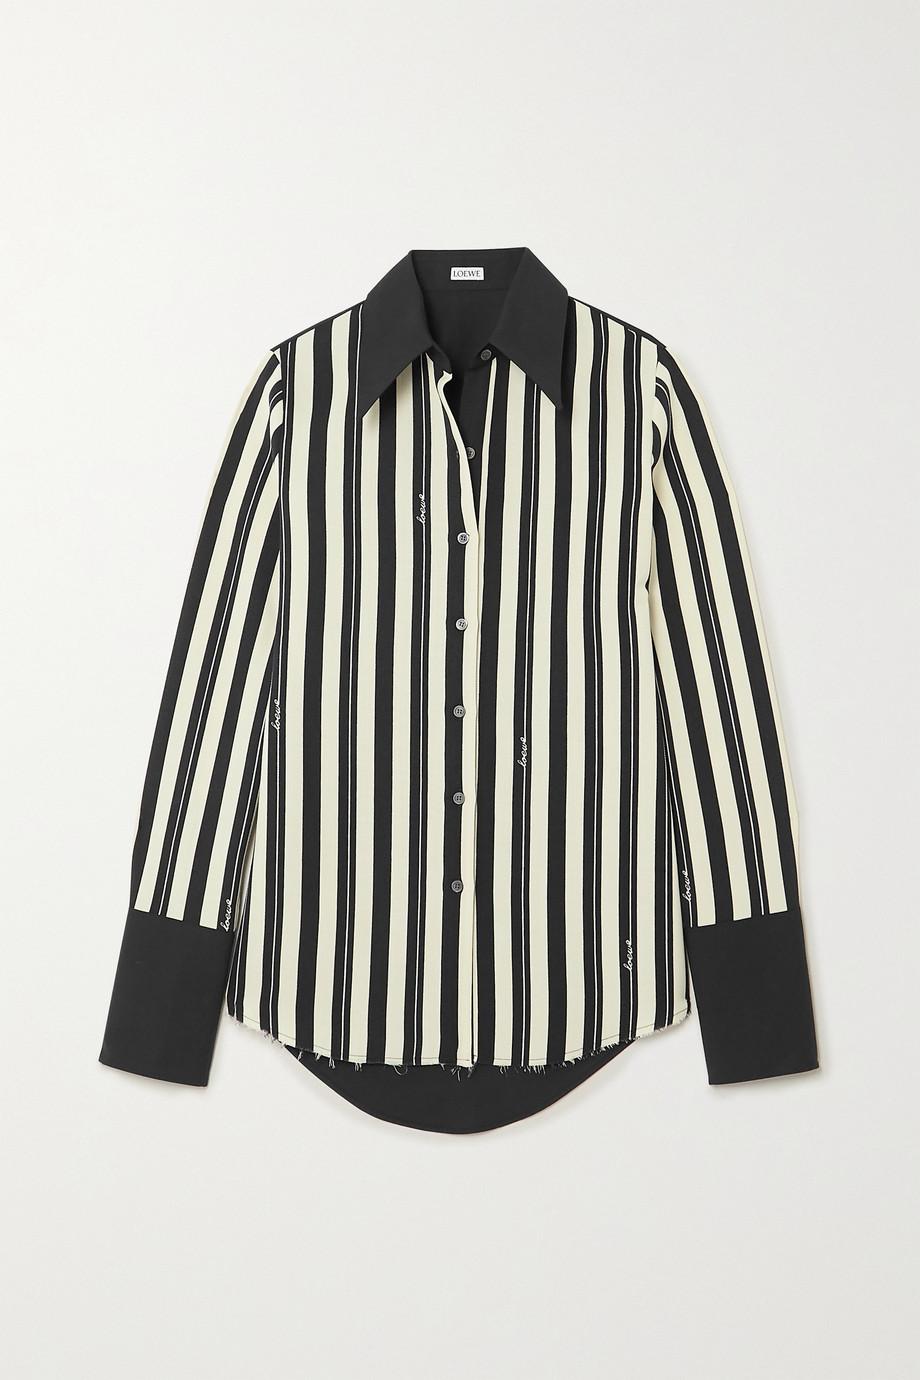 Loewe Striped wool-twill and cotton-poplin shirt